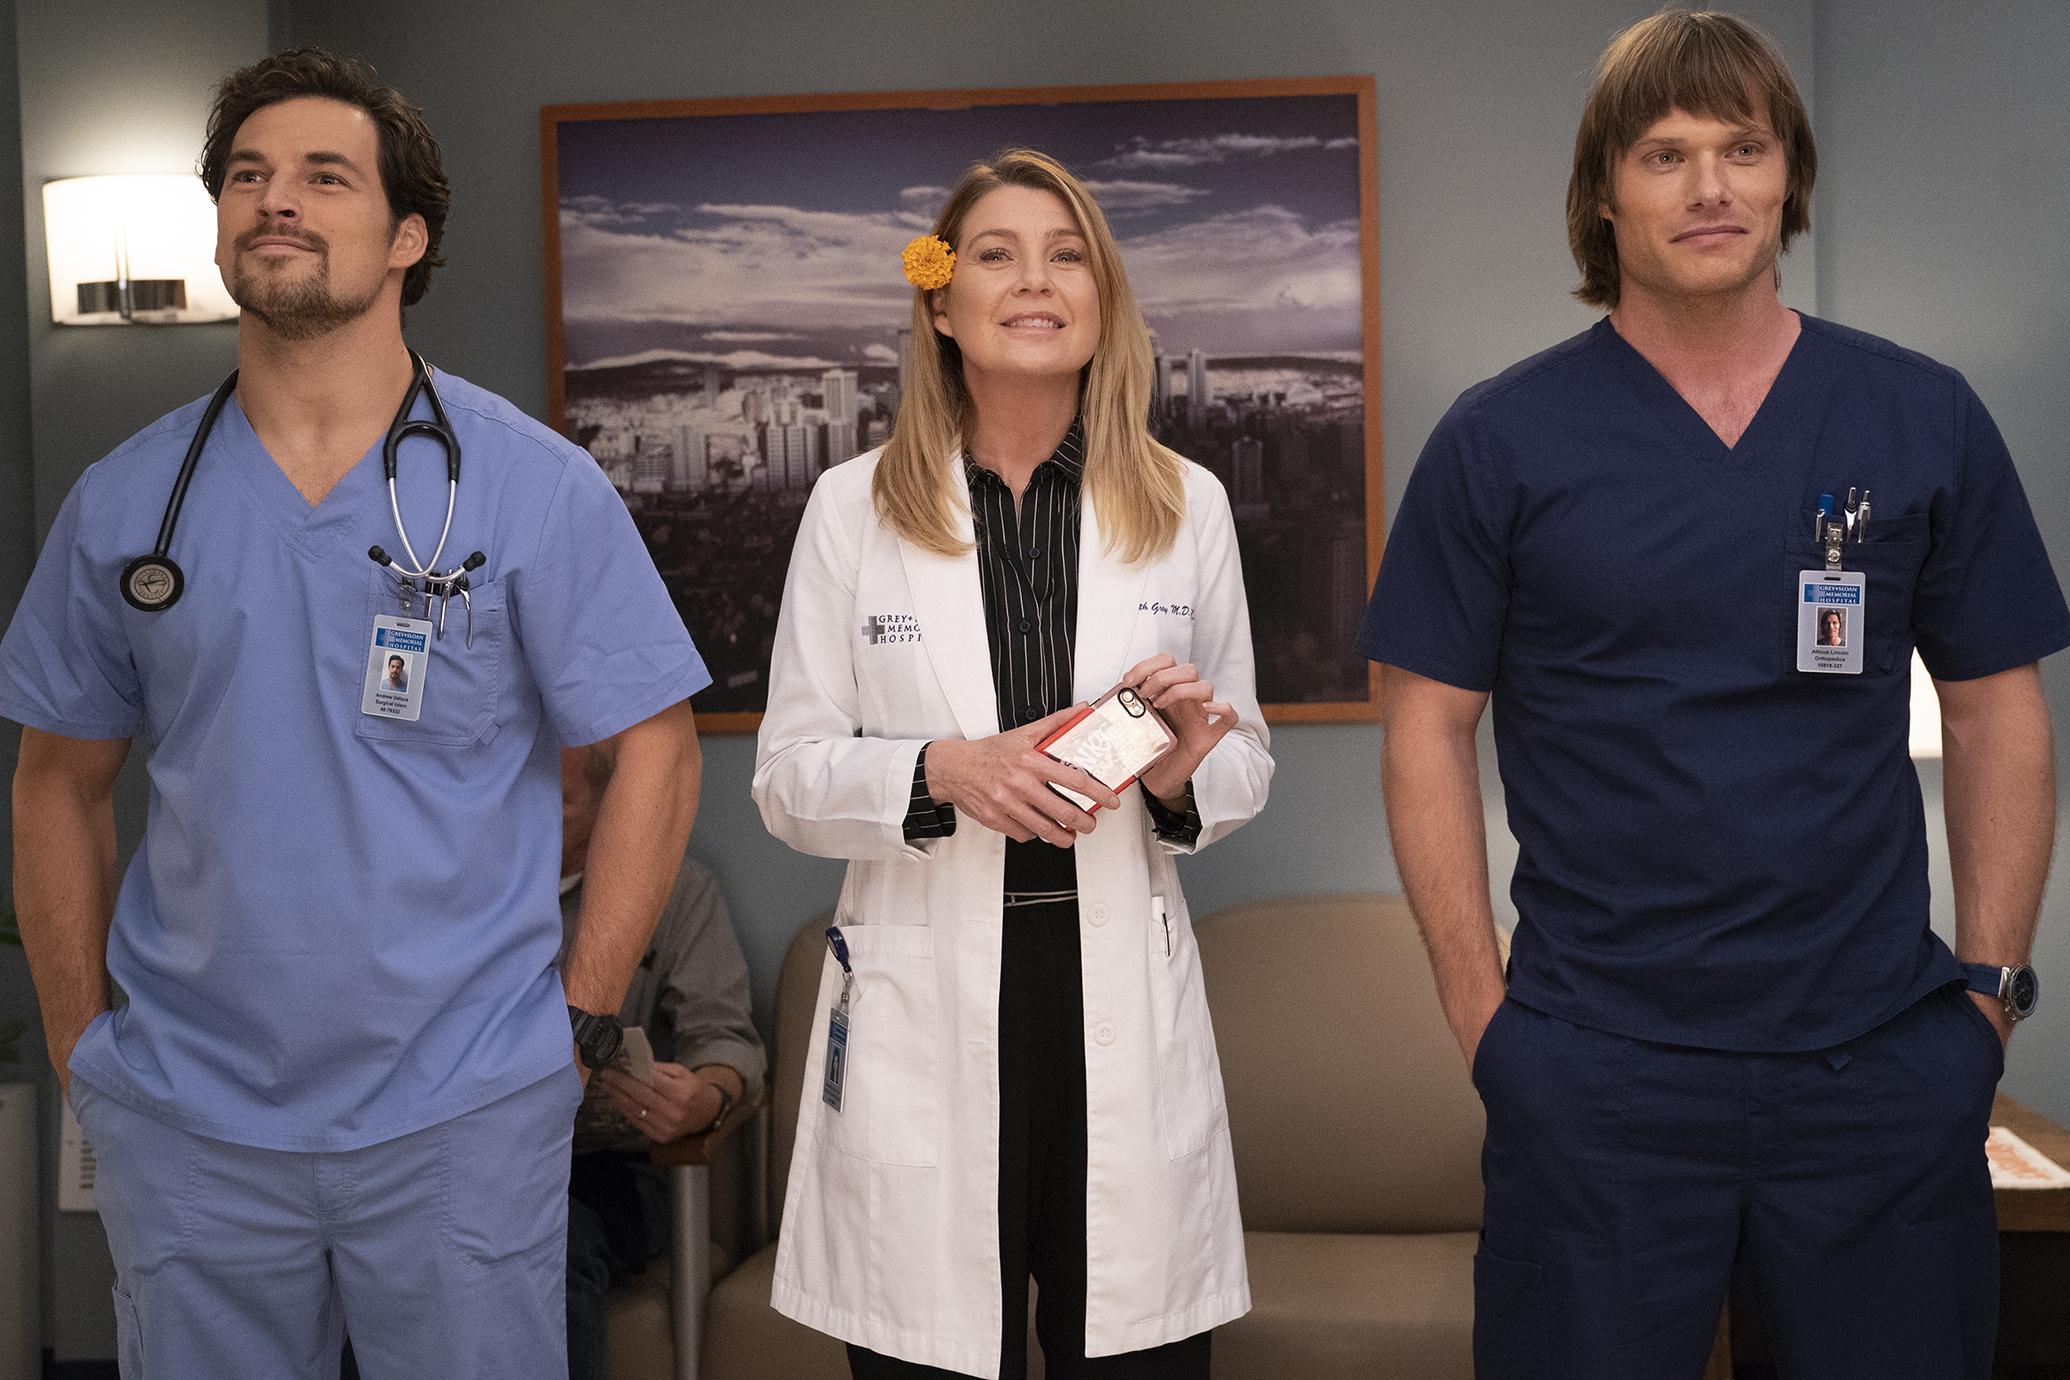 chirurdzy sezon 17 pandemia